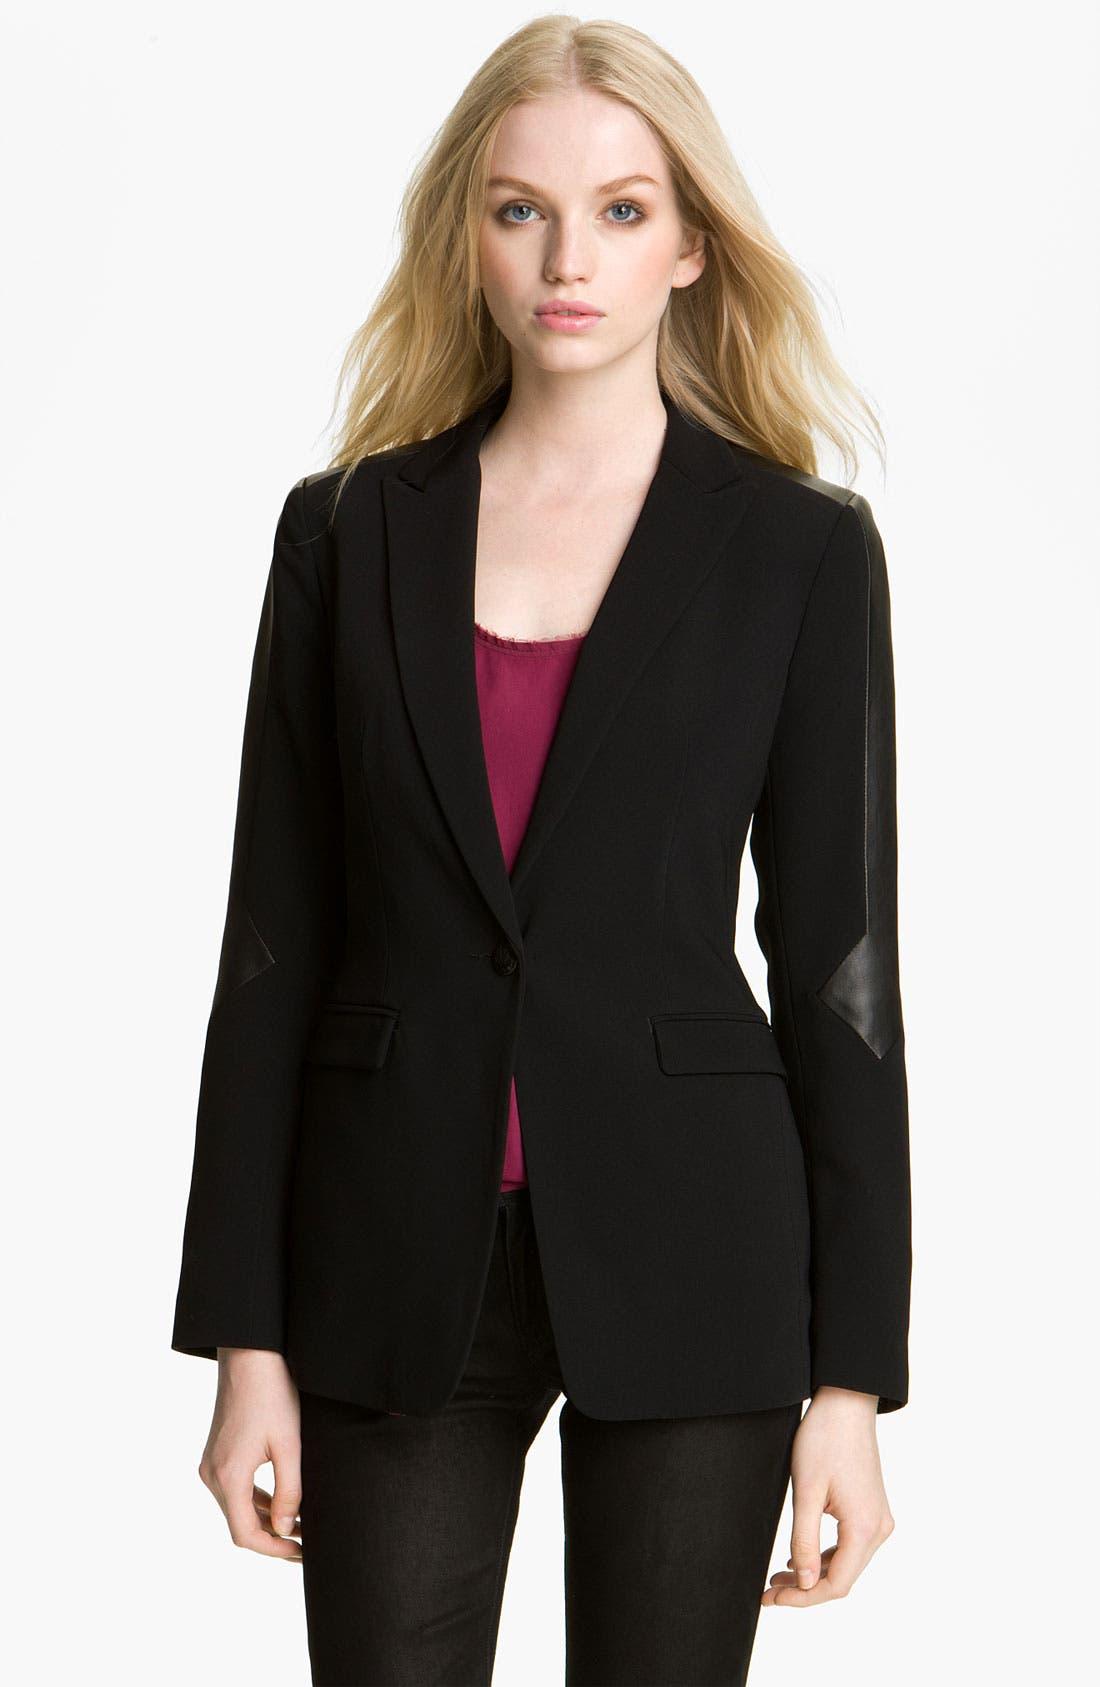 Alternate Image 1 Selected - rag & bone 'Gayatri' Leather Trim Blazer